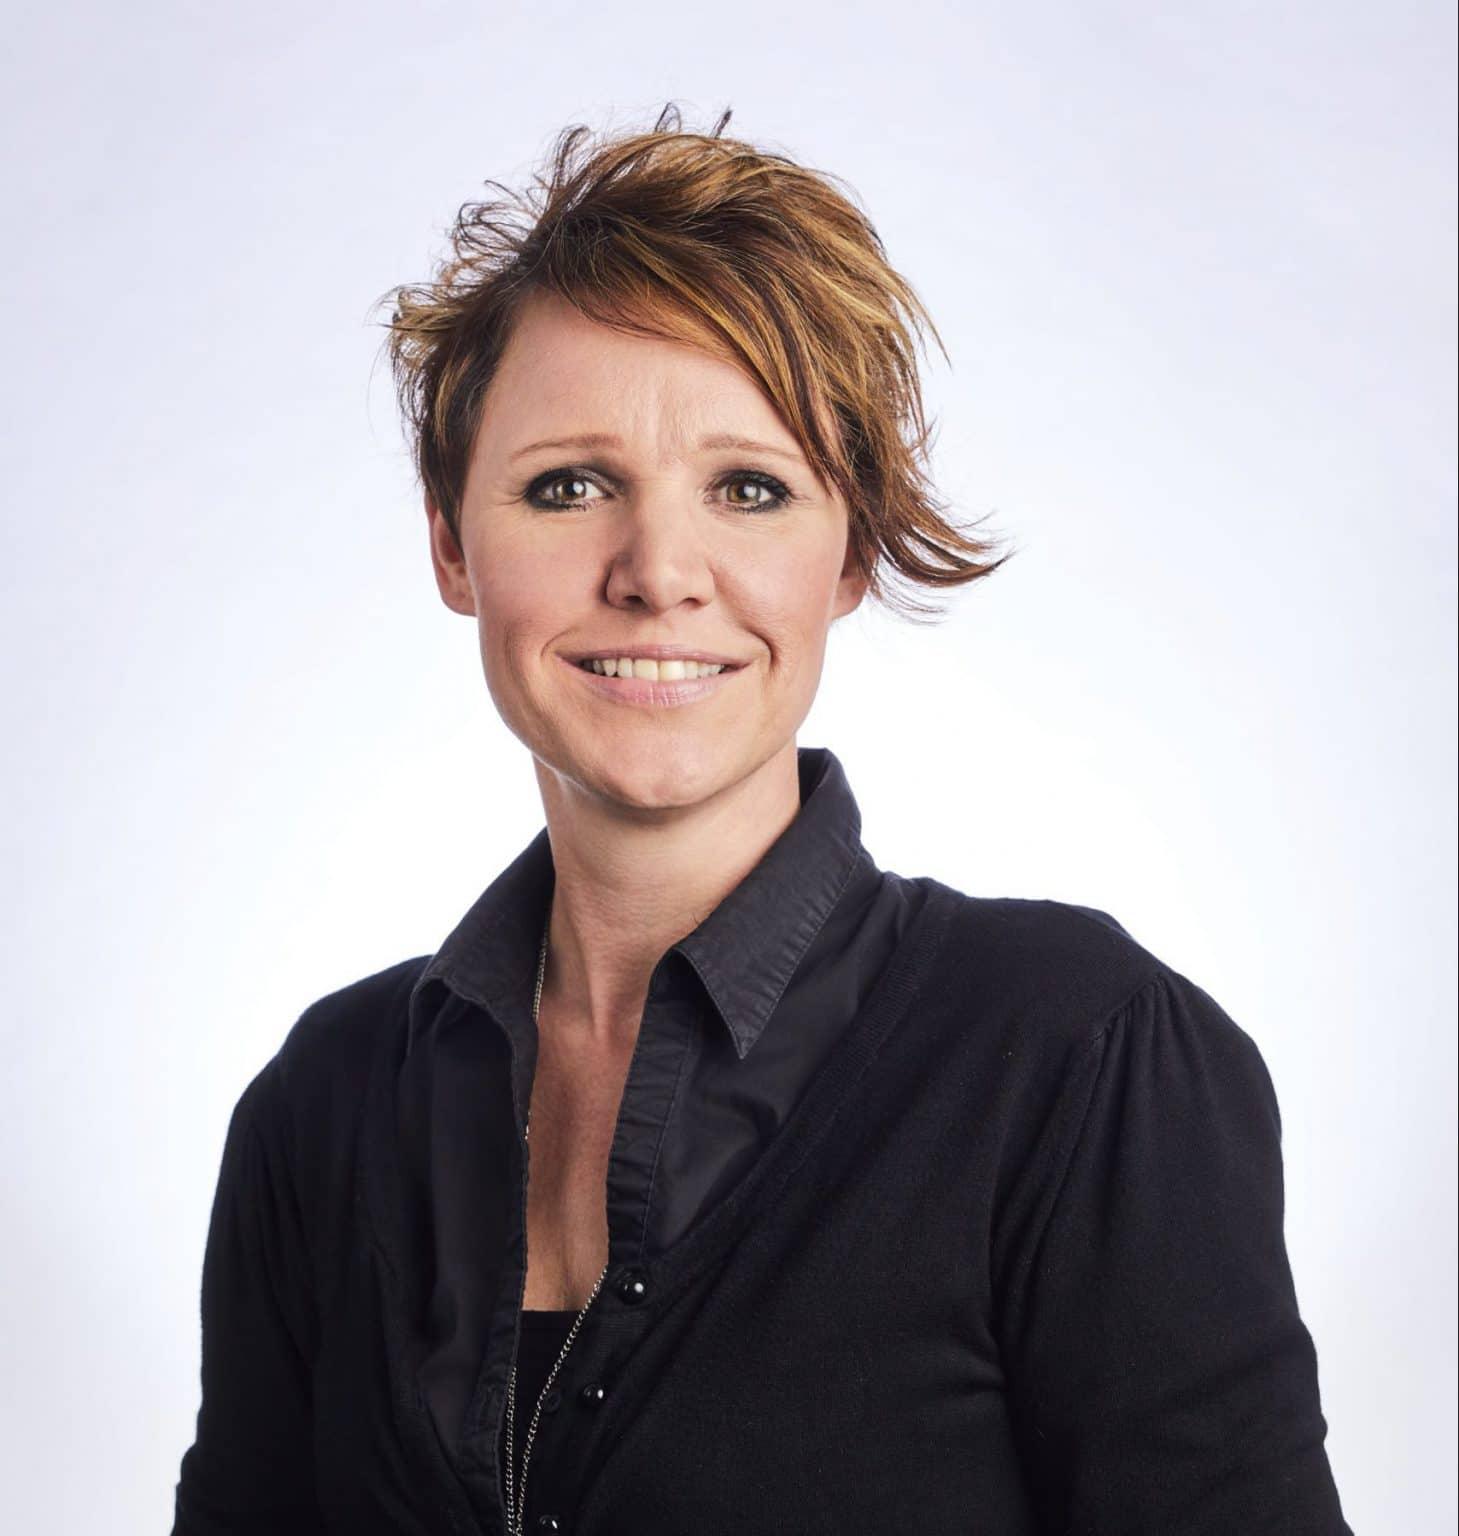 Mariska Wisman